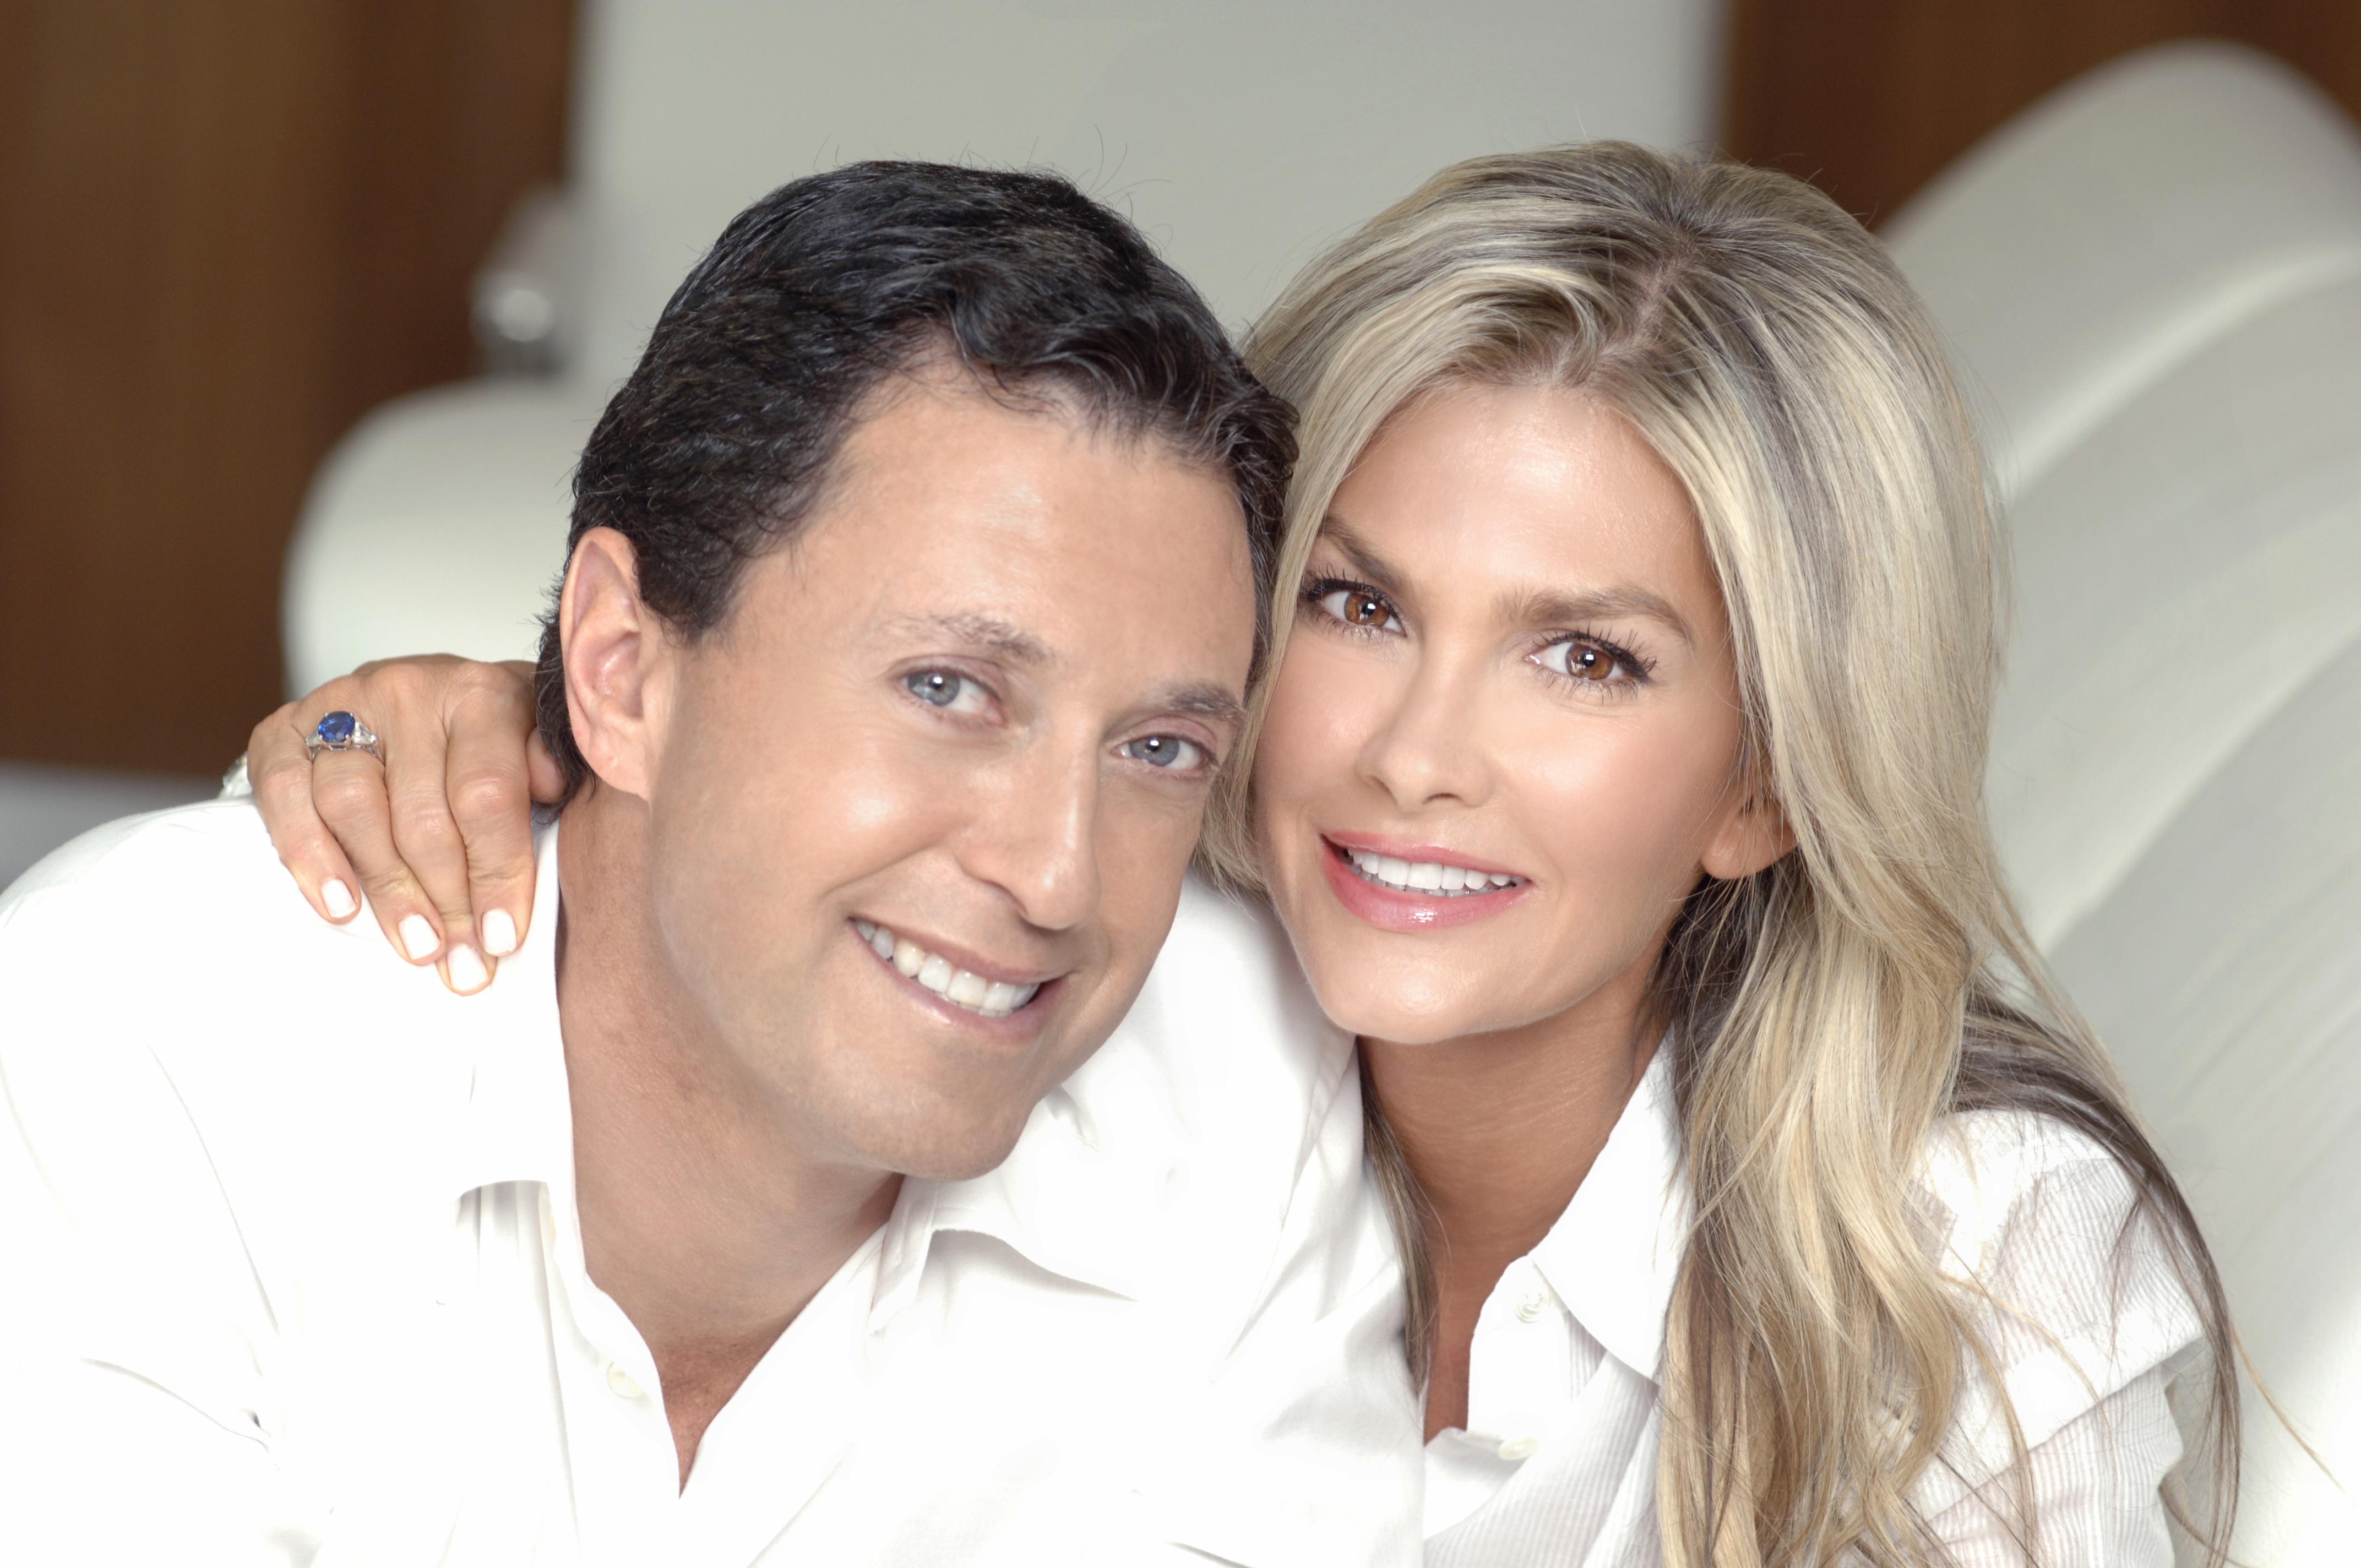 Christine Avanti and Jonathon Fischer